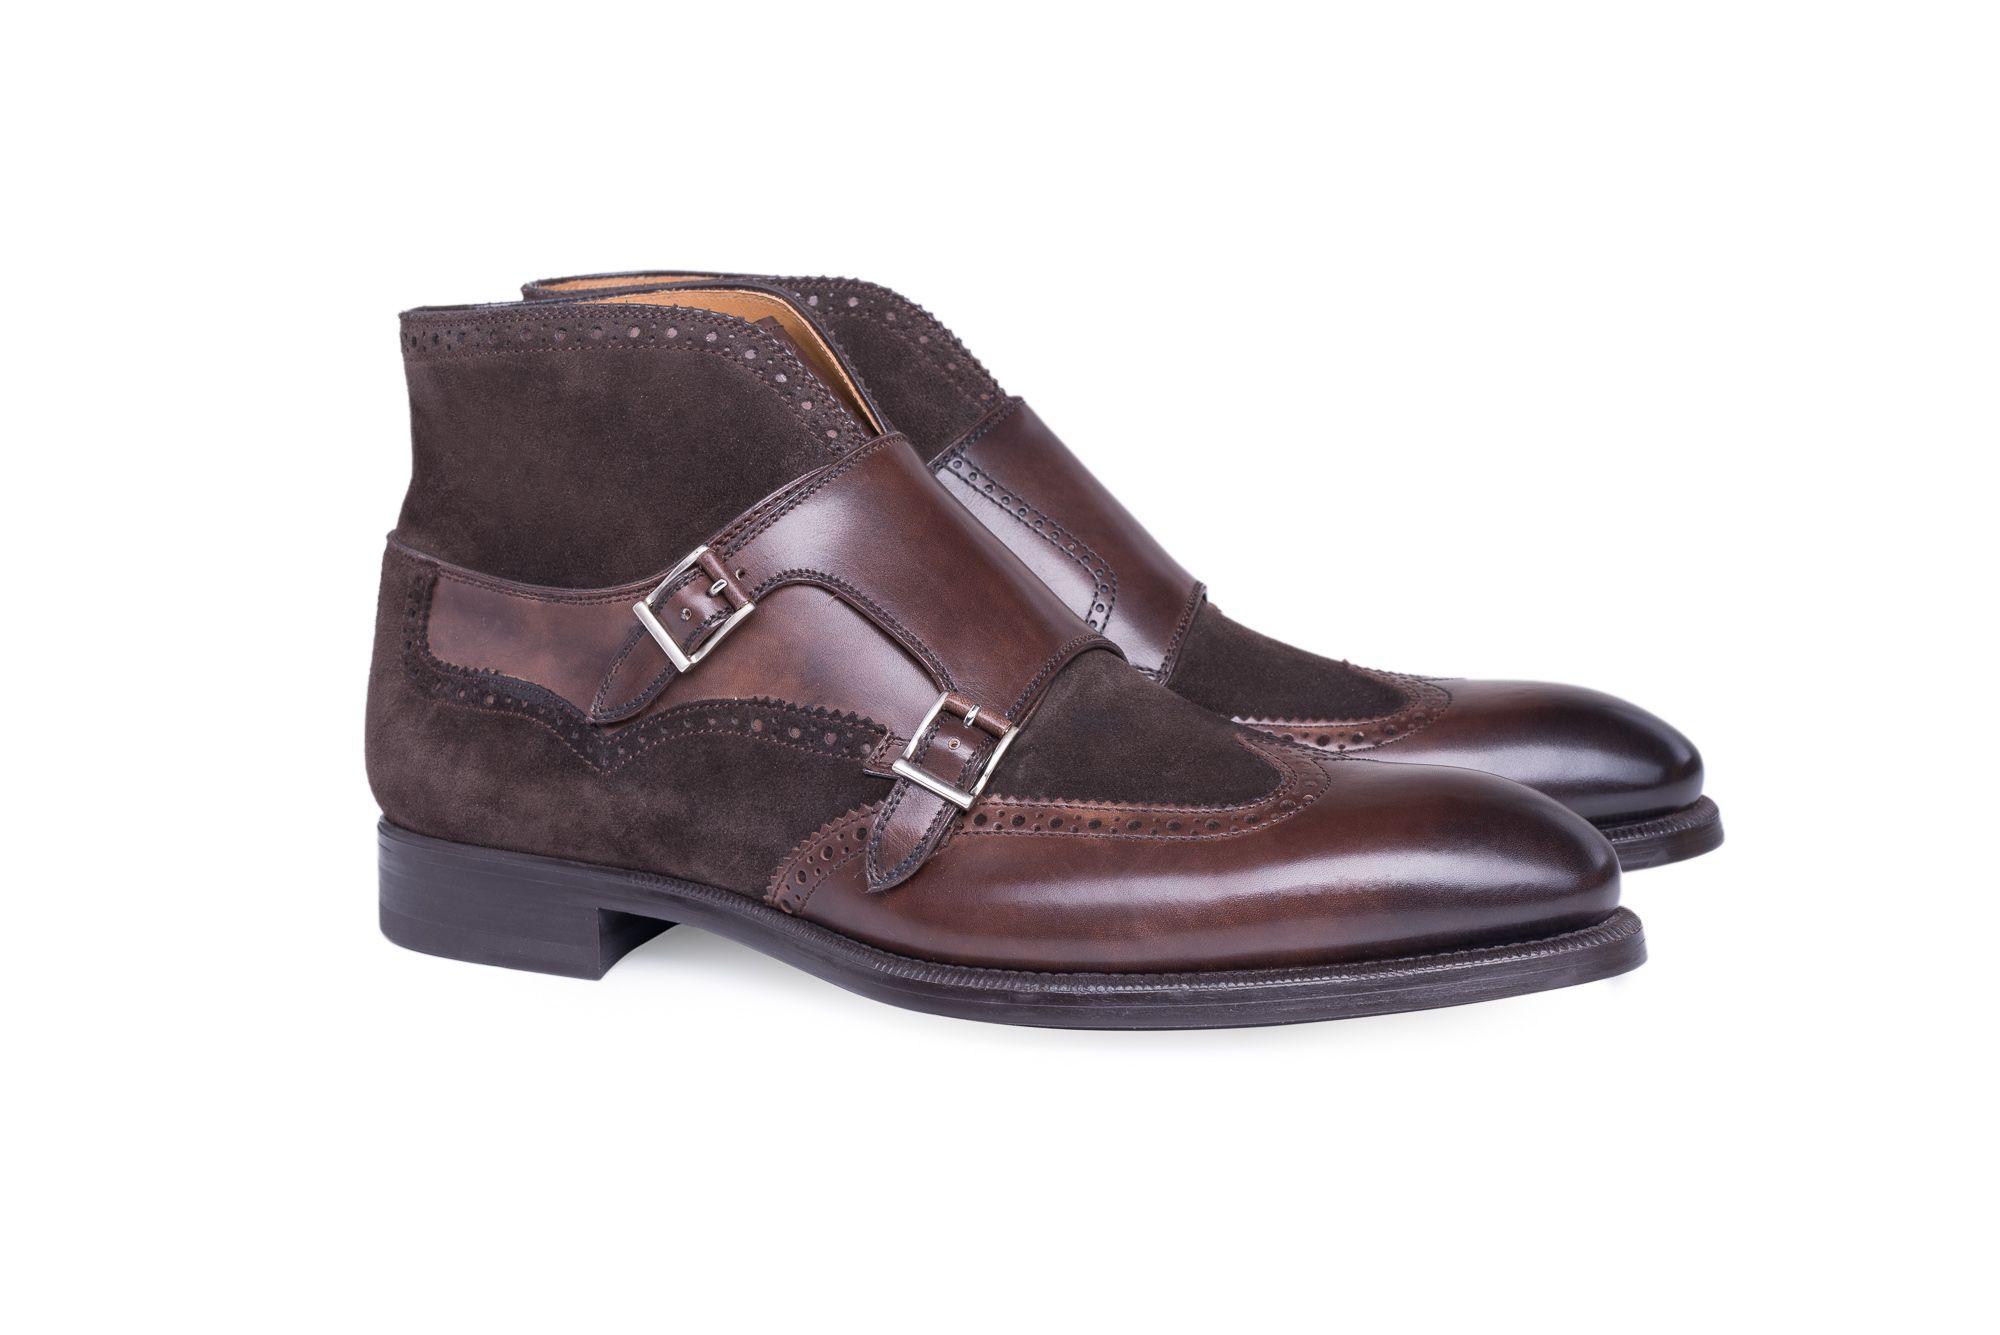 e12127d6b1f3 Extravagantní kotníčkové full brogue double monk shoes